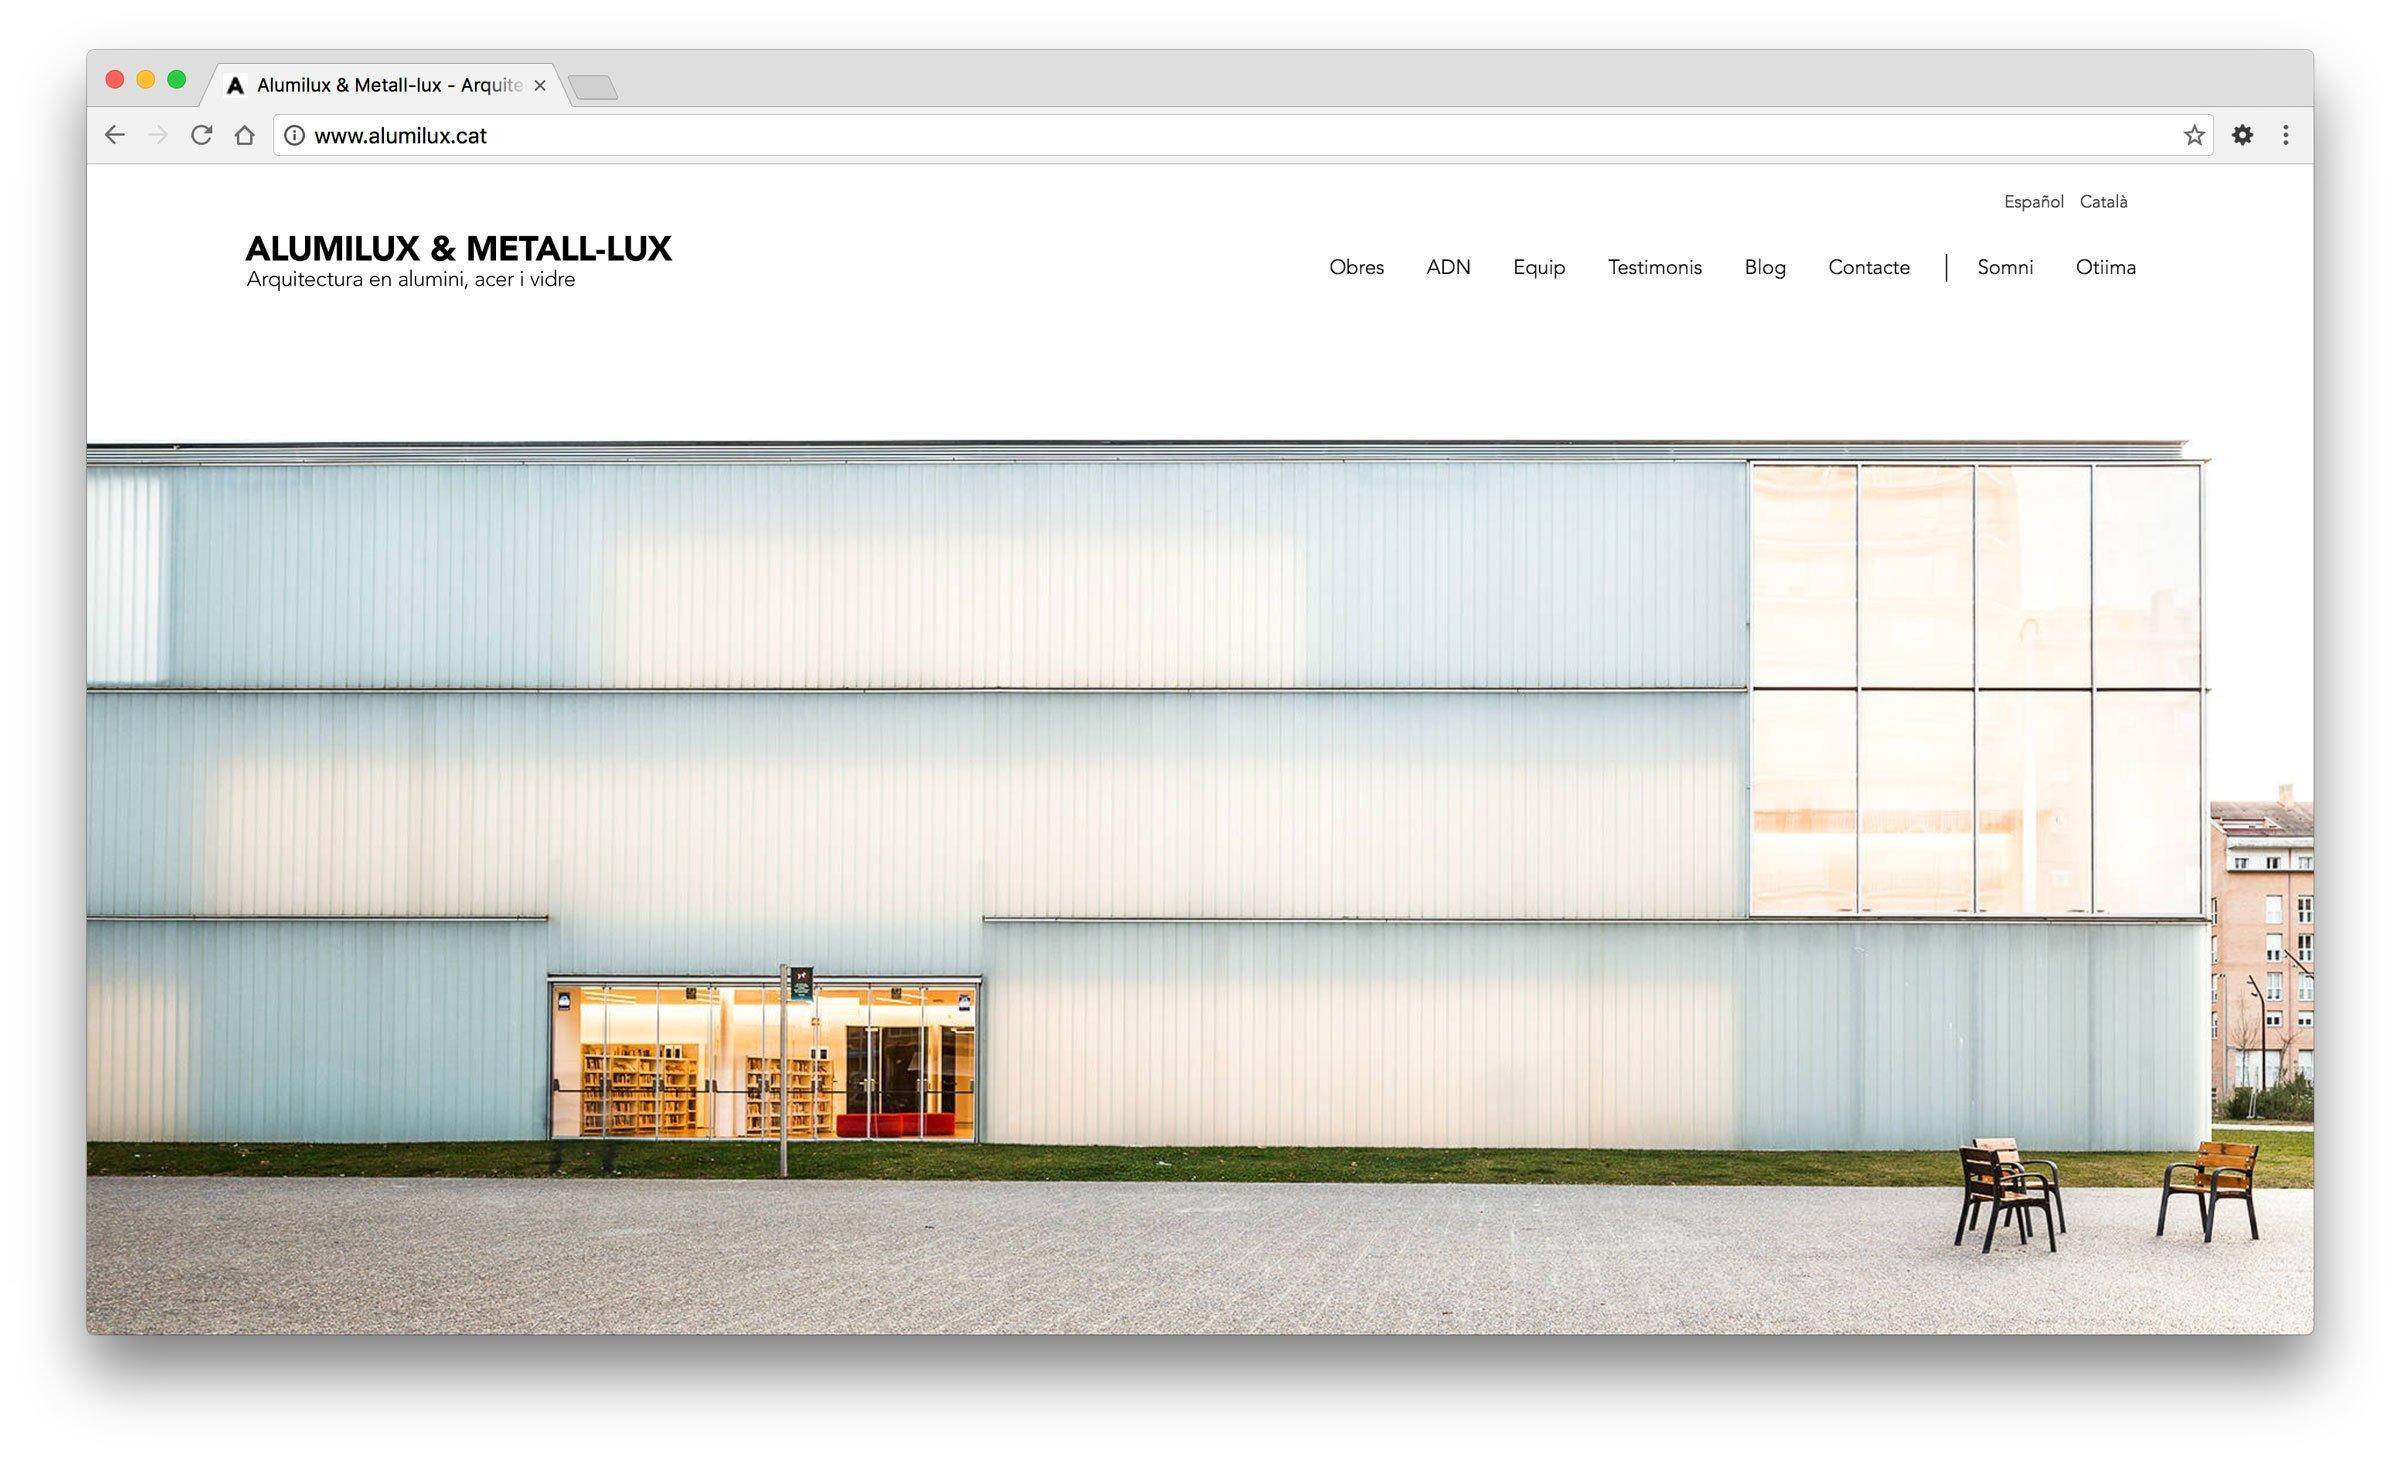 Disseny web per Alumilux & Metall-lux